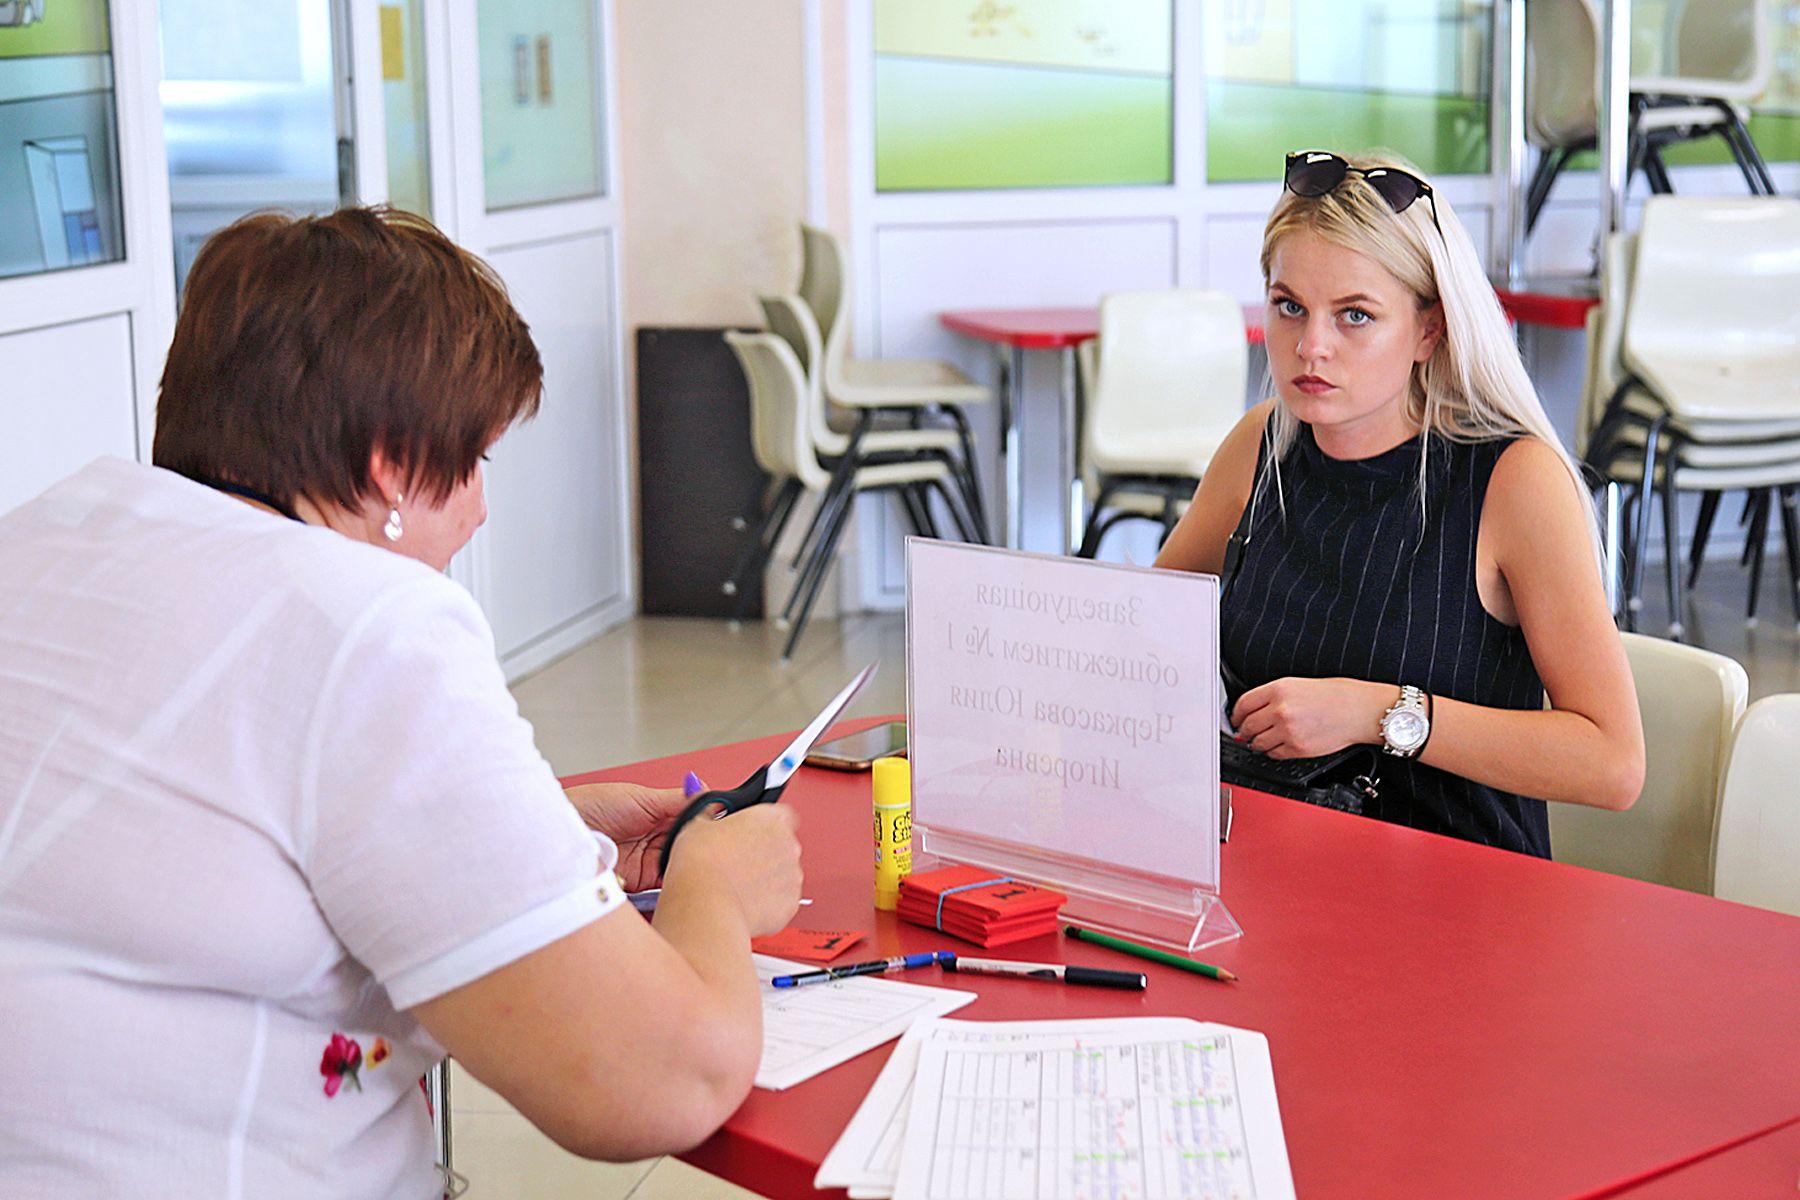 Общежития ВГУЭС принимают студентов бакалавриата и специалитета